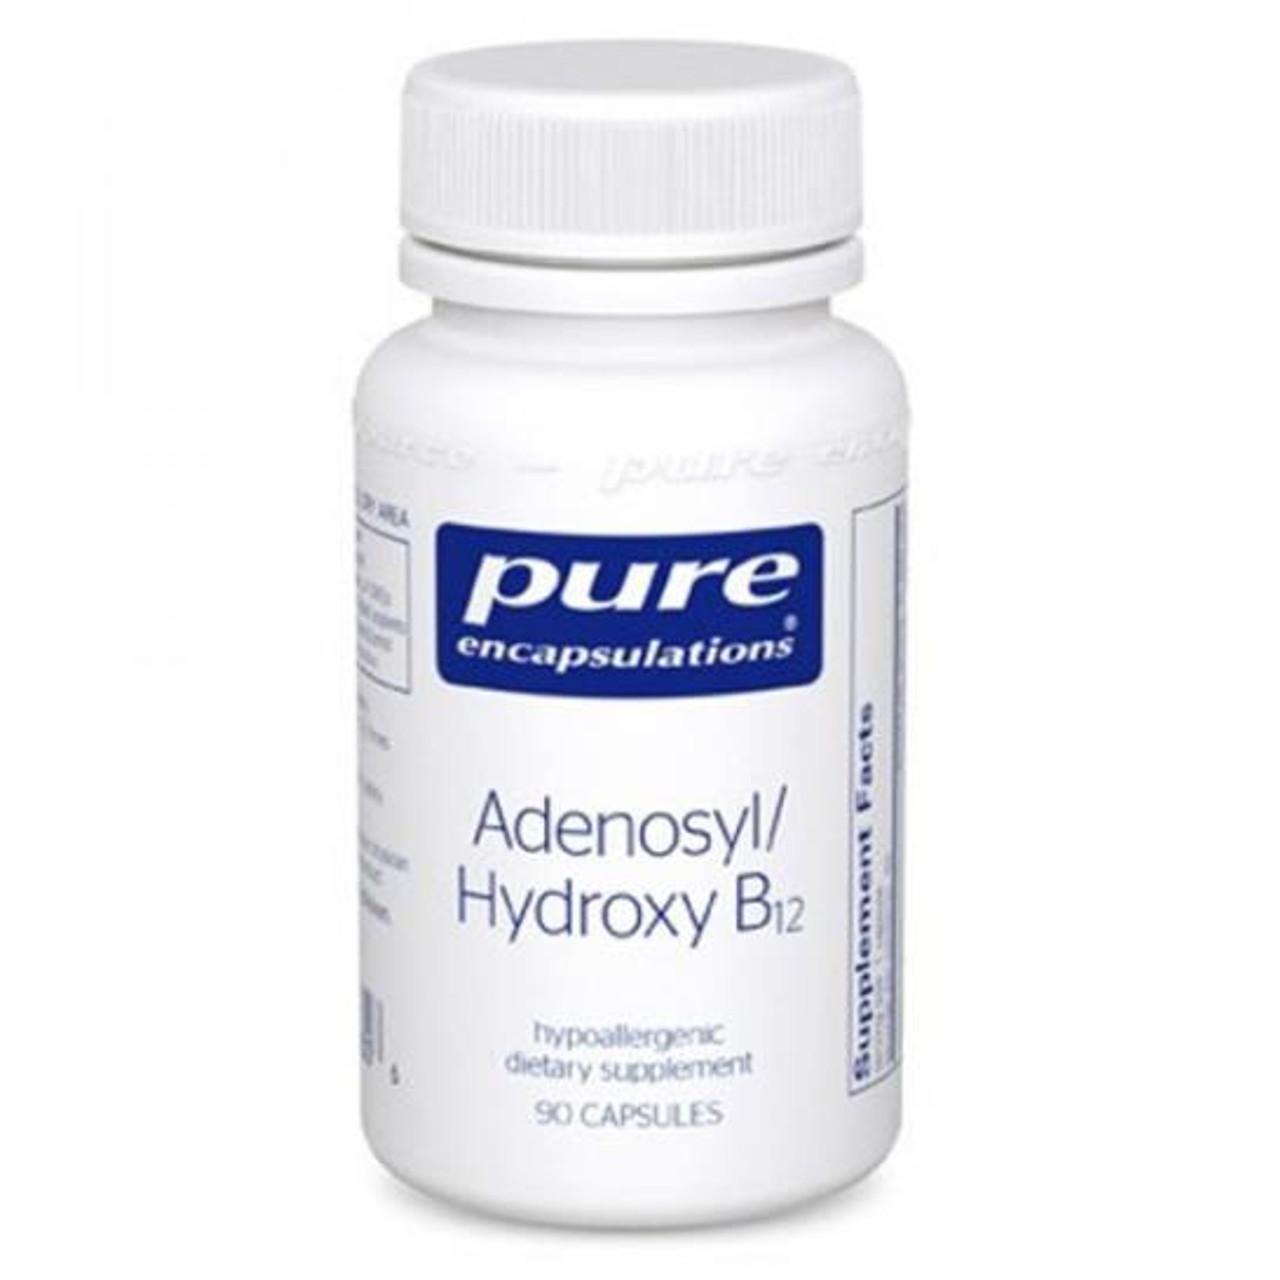 Adenosyl/Hydroxy B12 90 Caps